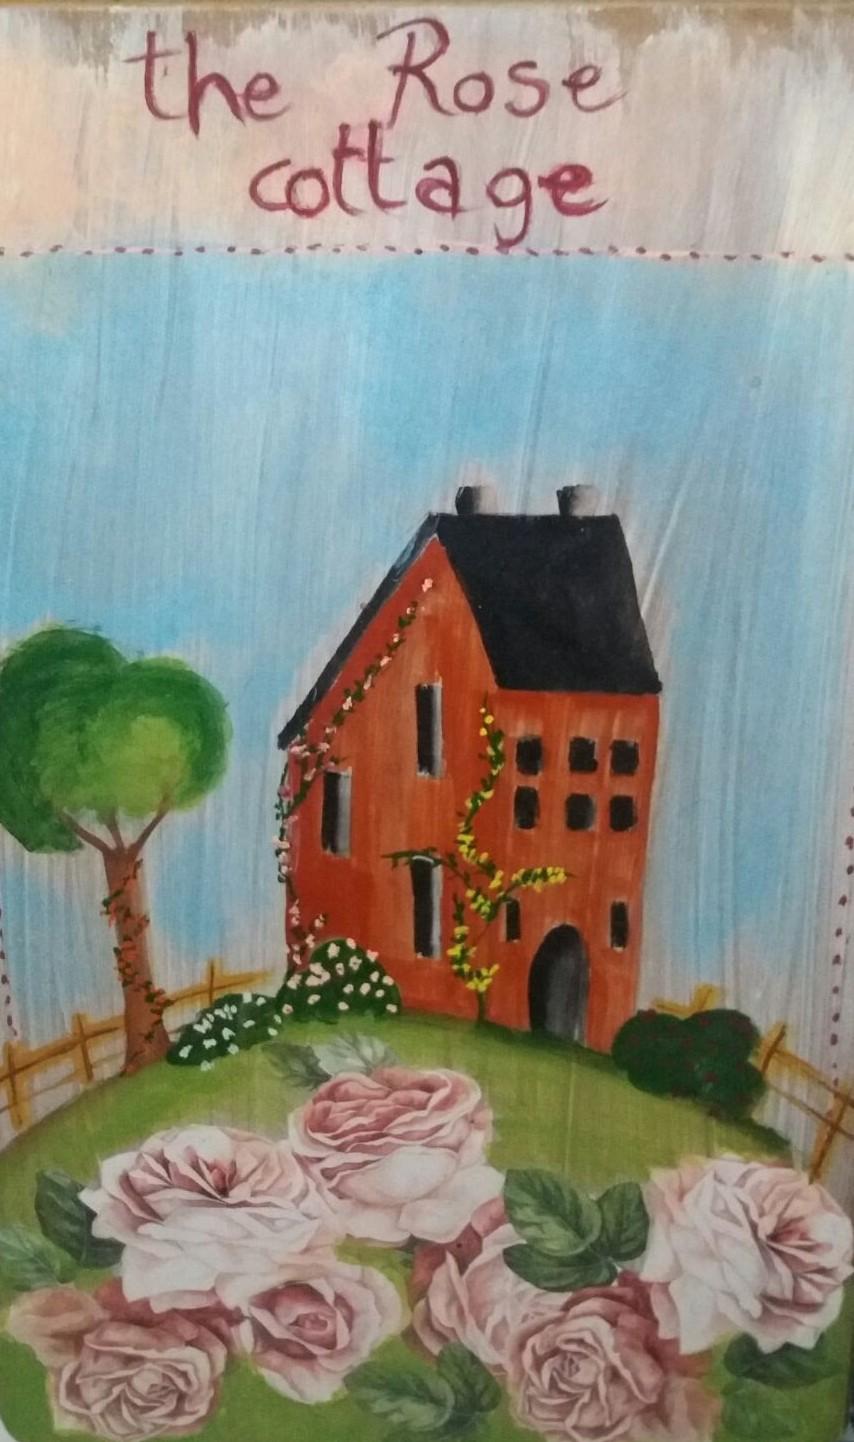 Our rose cottage garden